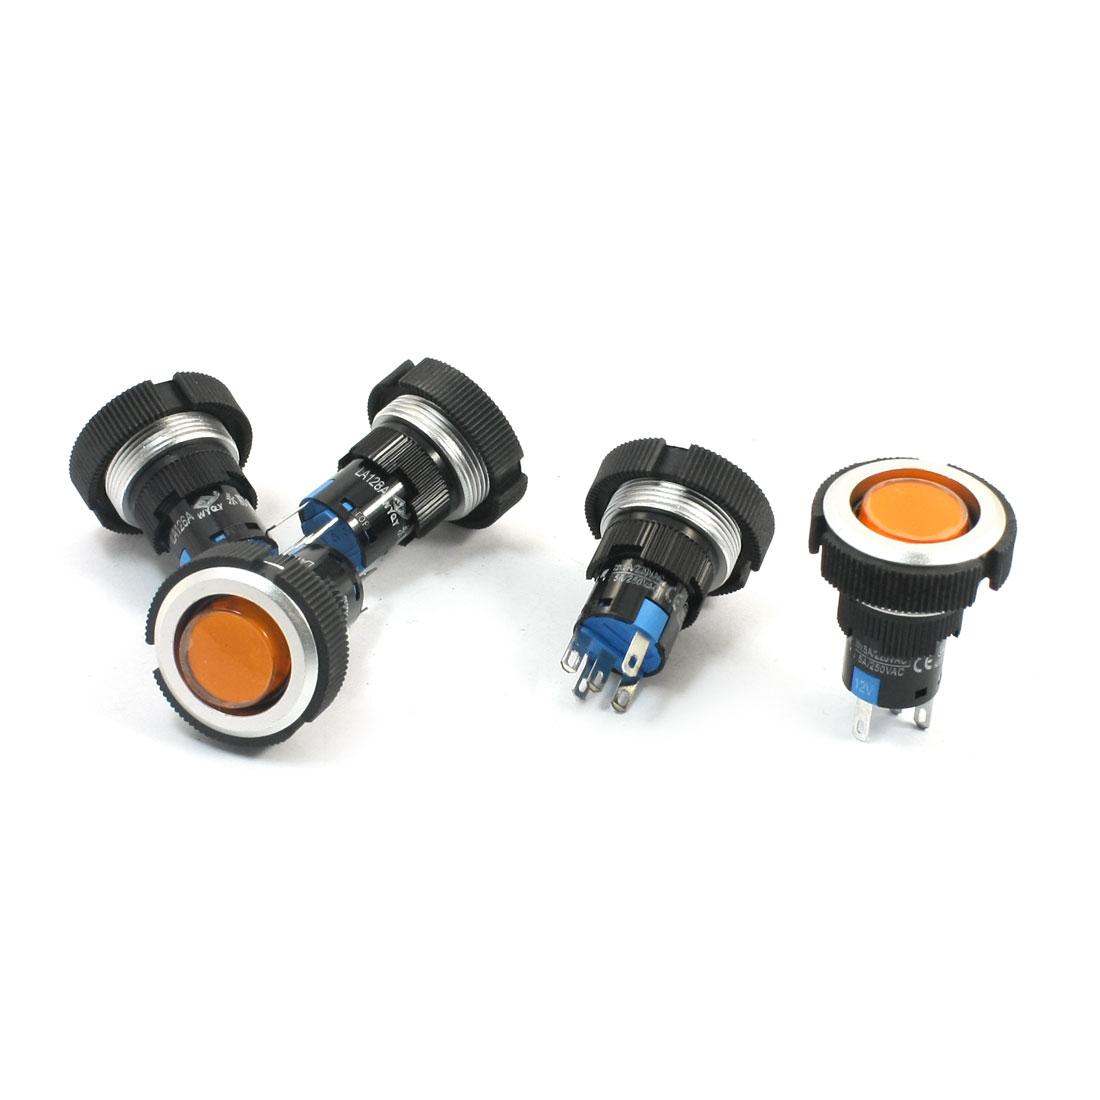 5 Pcs 12V 22mm Thread Panel Mount SPDT 1NO 1NC 5Pin Soldering Locking Orange Pilot Lamp Pushbutton Switch